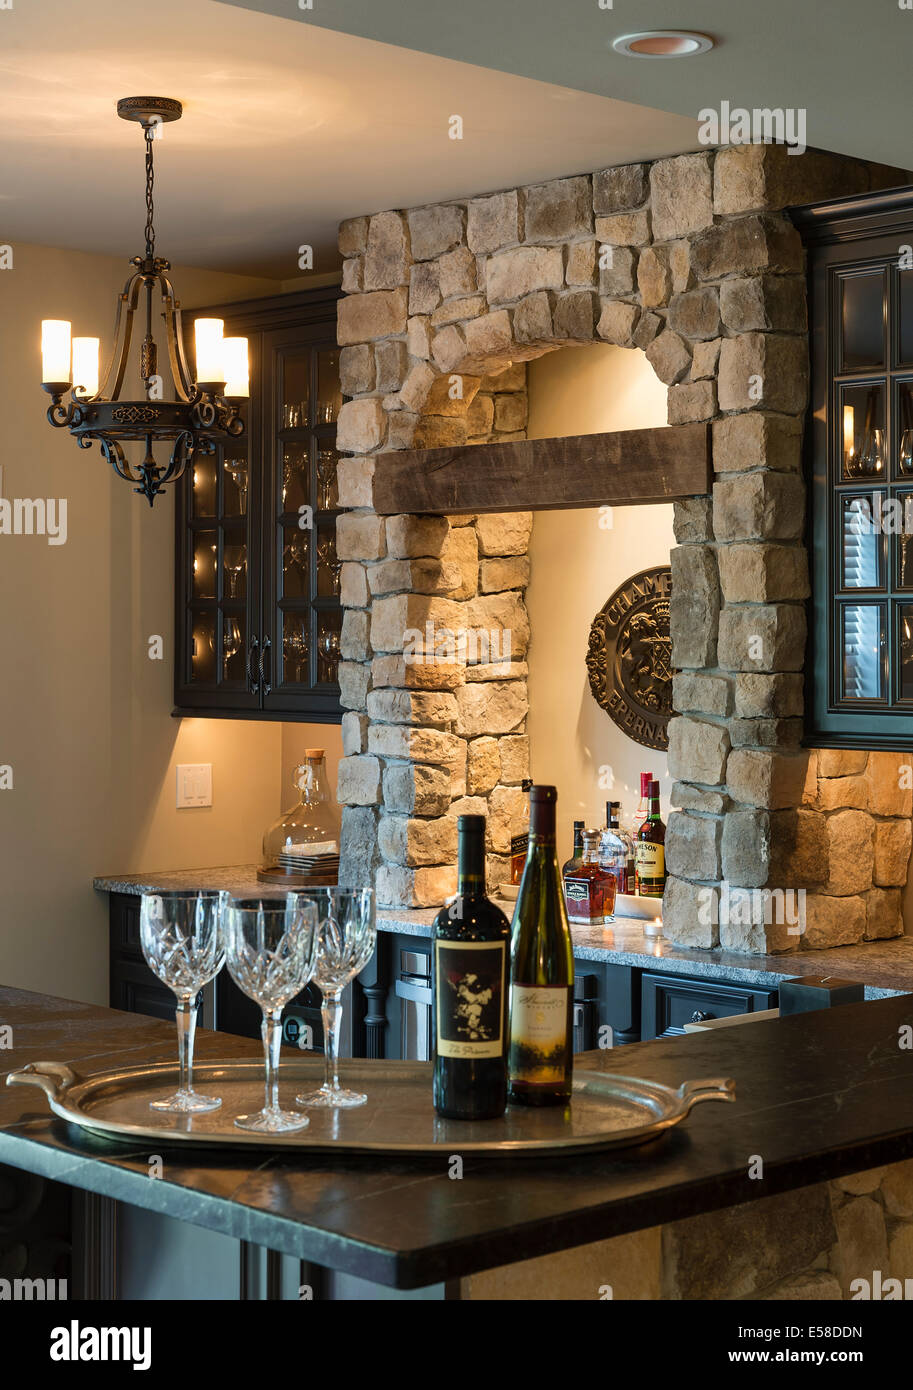 Basement Bar Stockfotos & Basement Bar Bilder - Alamy